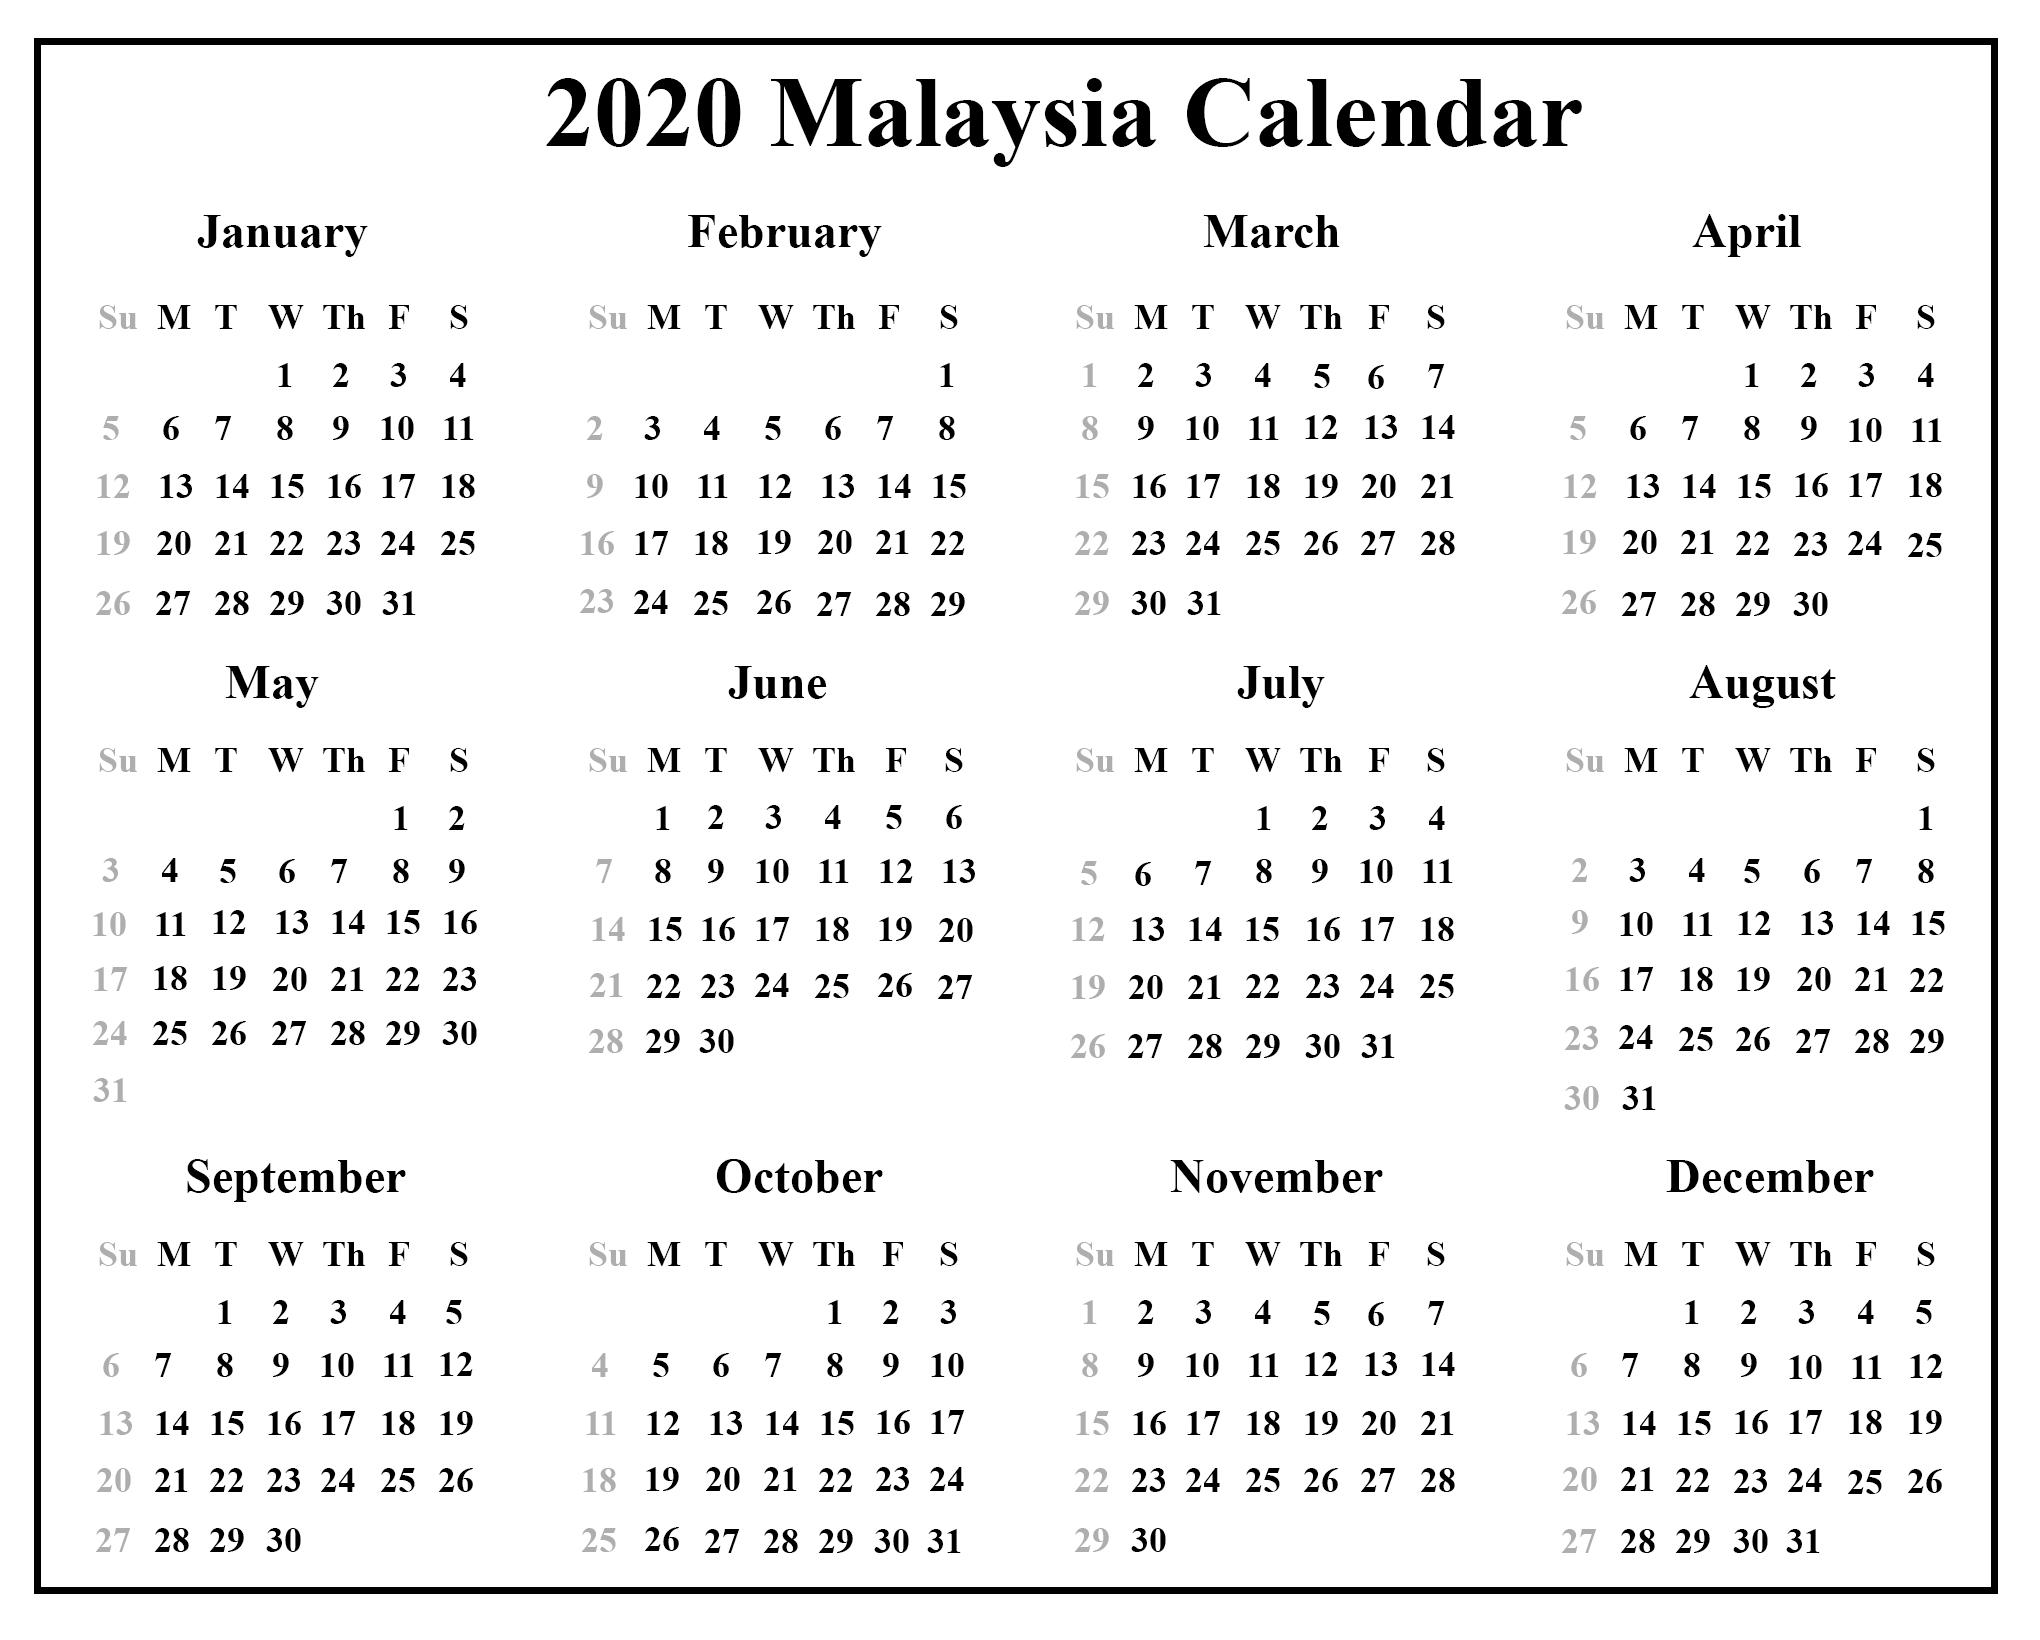 Free 2020 Malaysia Calendar With Holidays {Pdf & Excel & Word}